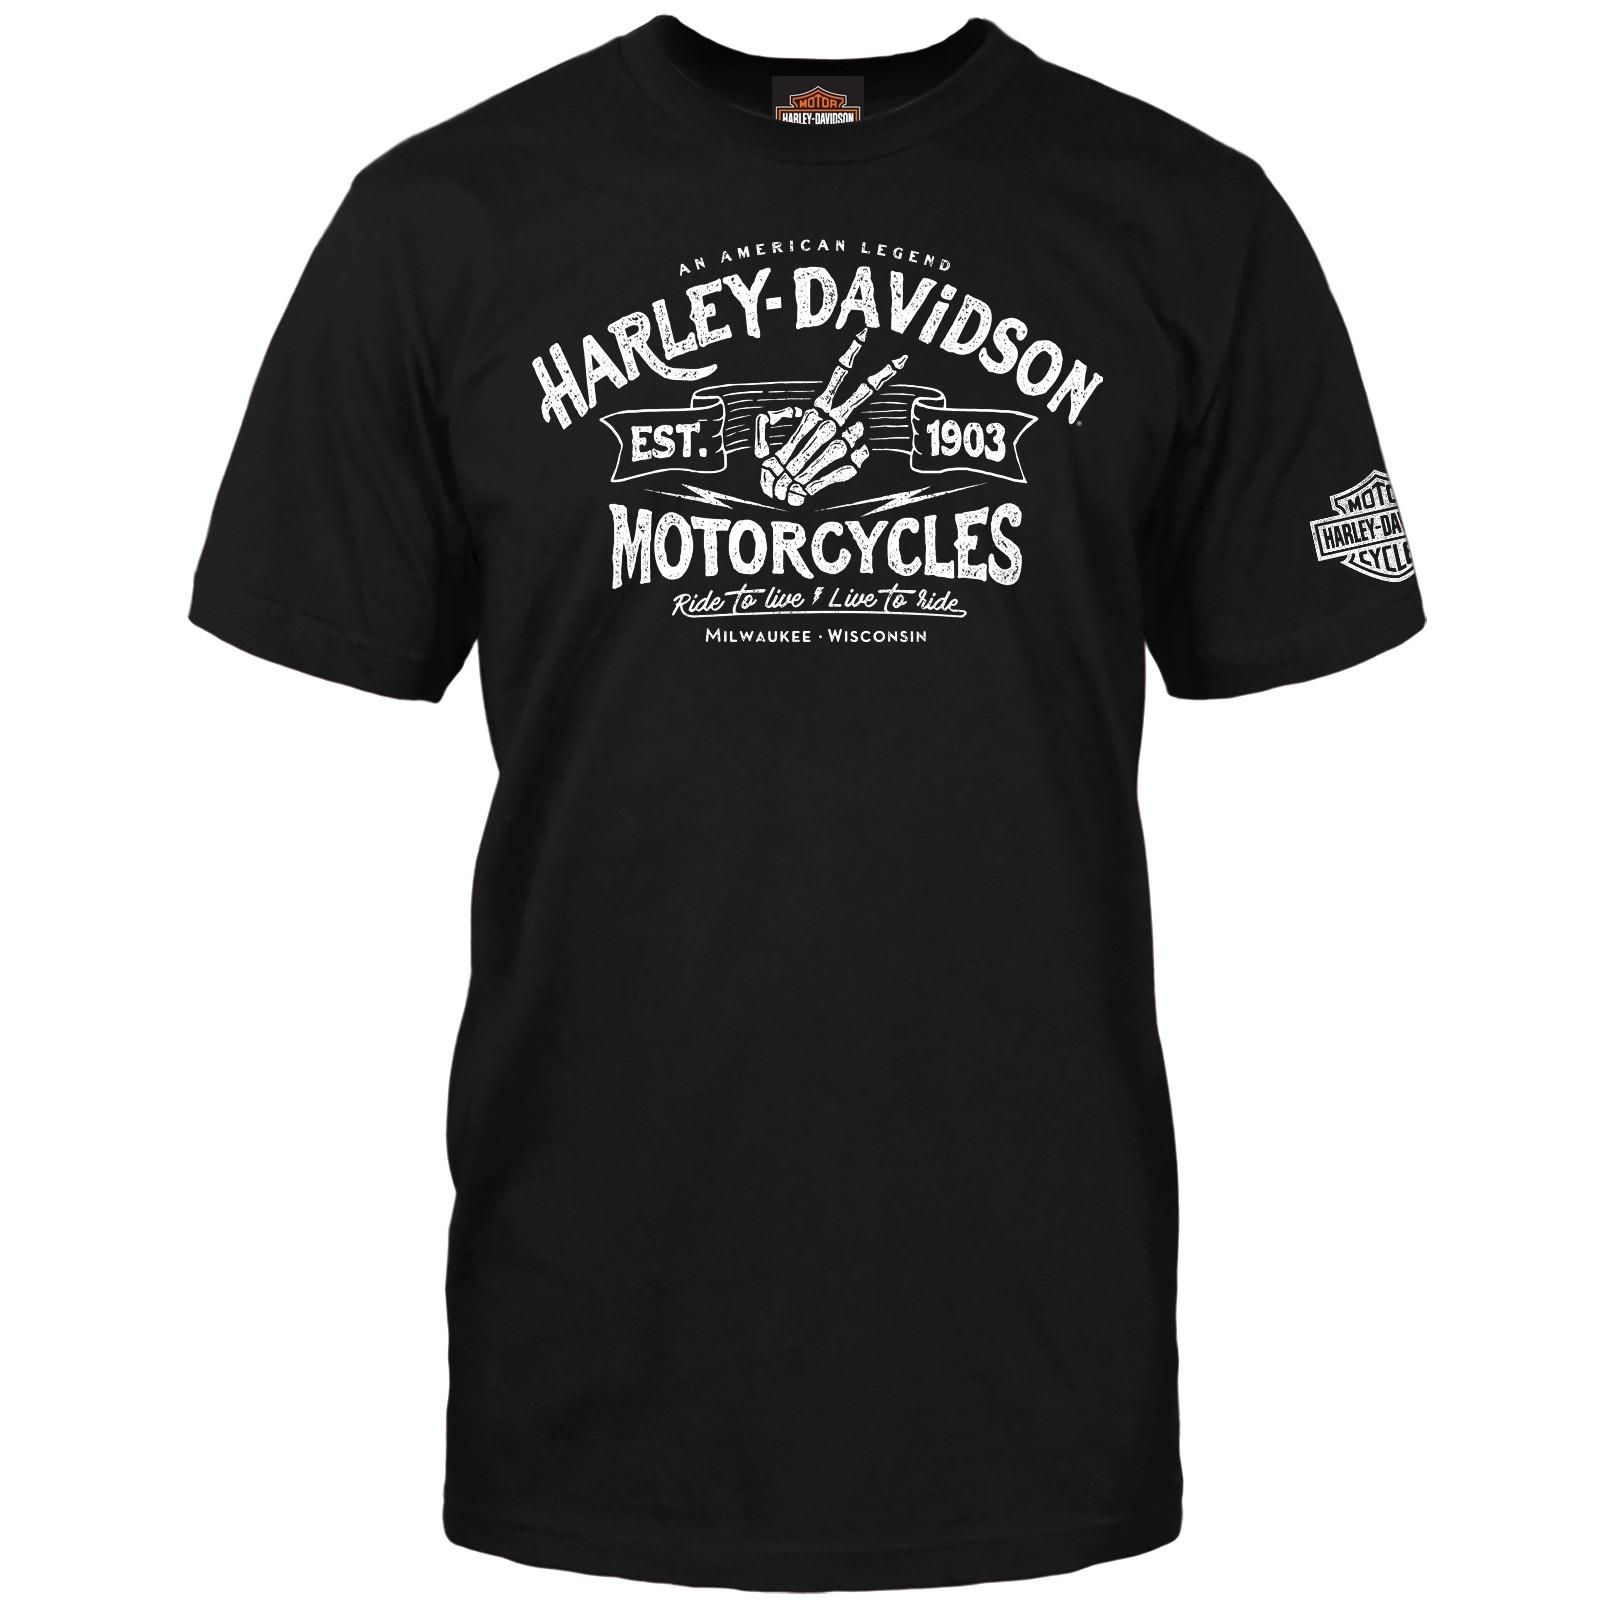 Harley-Davidson Men's Short-Sleeve Graphic T-Shirt - NAS Sigonella | Wave